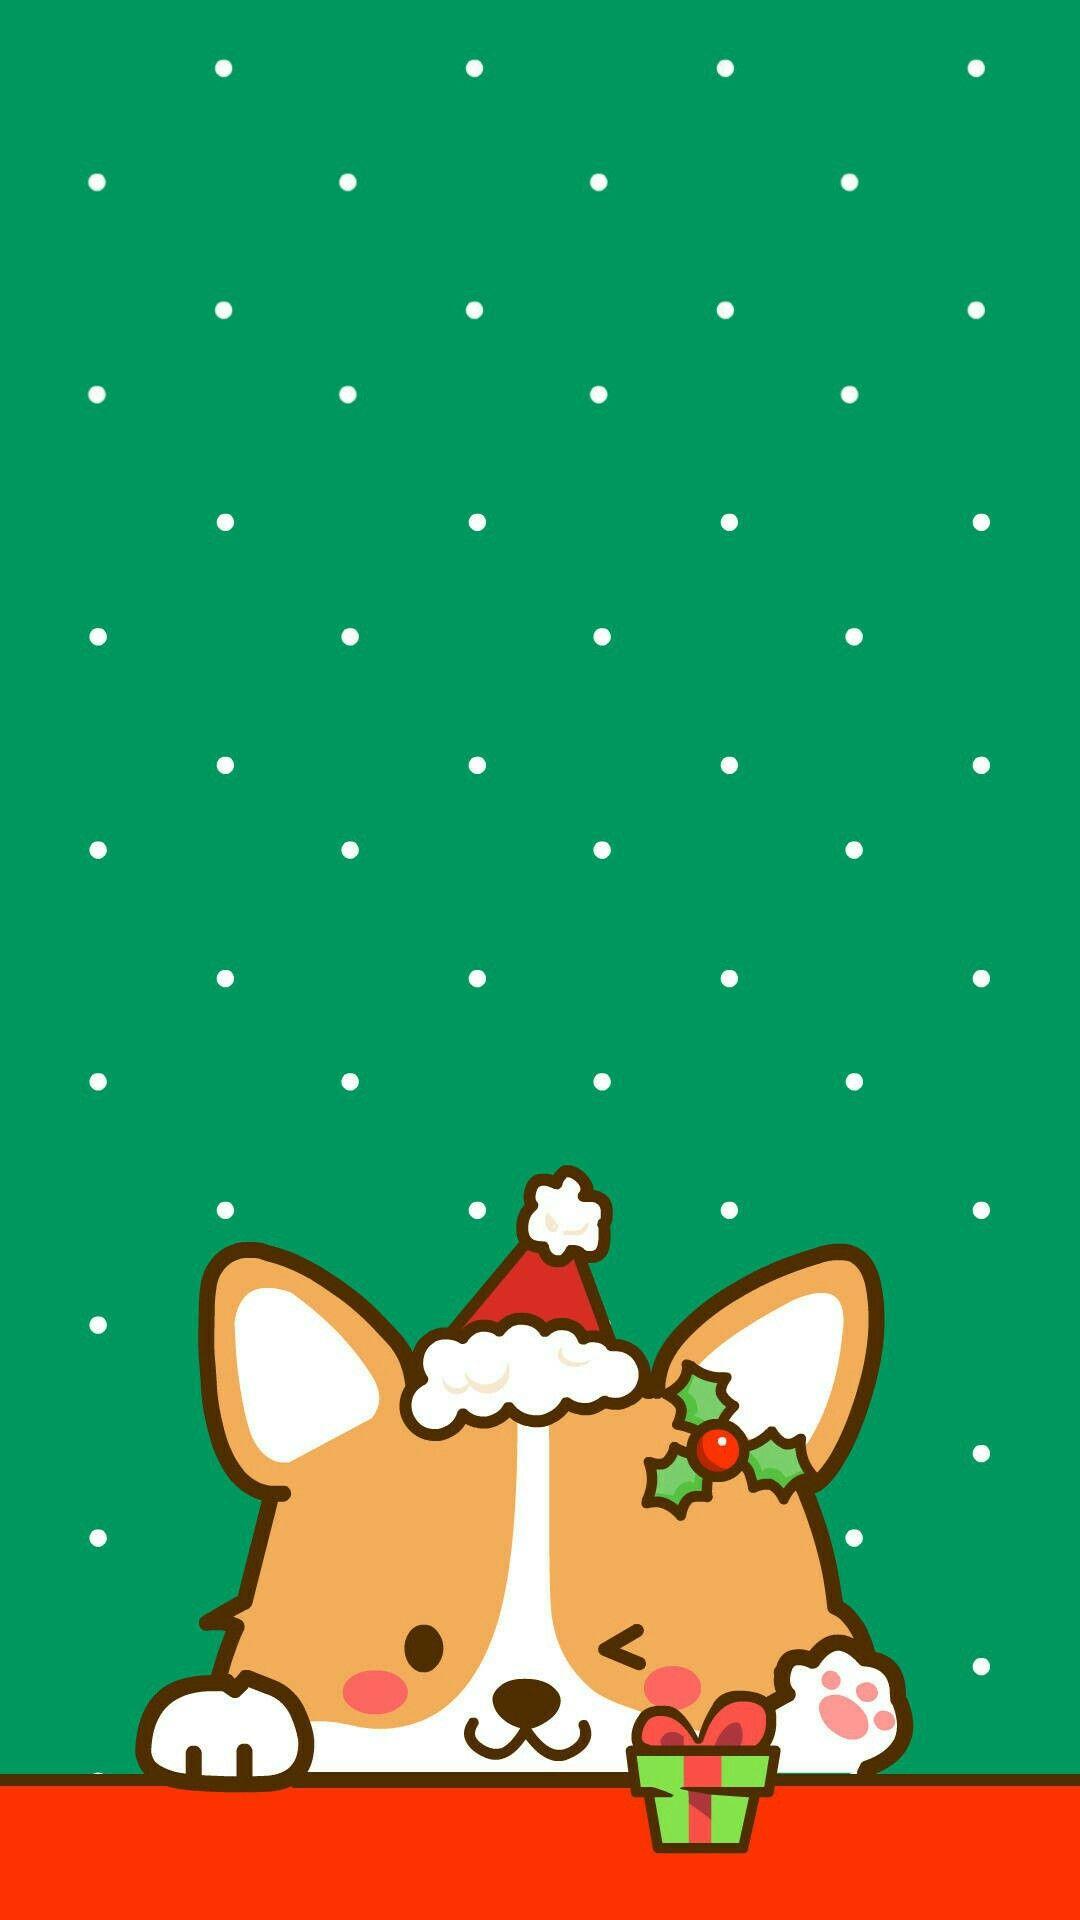 Pin By May Min On Backgrounds Corgi Wallpaper Cute Christmas Wallpaper Corgi Art